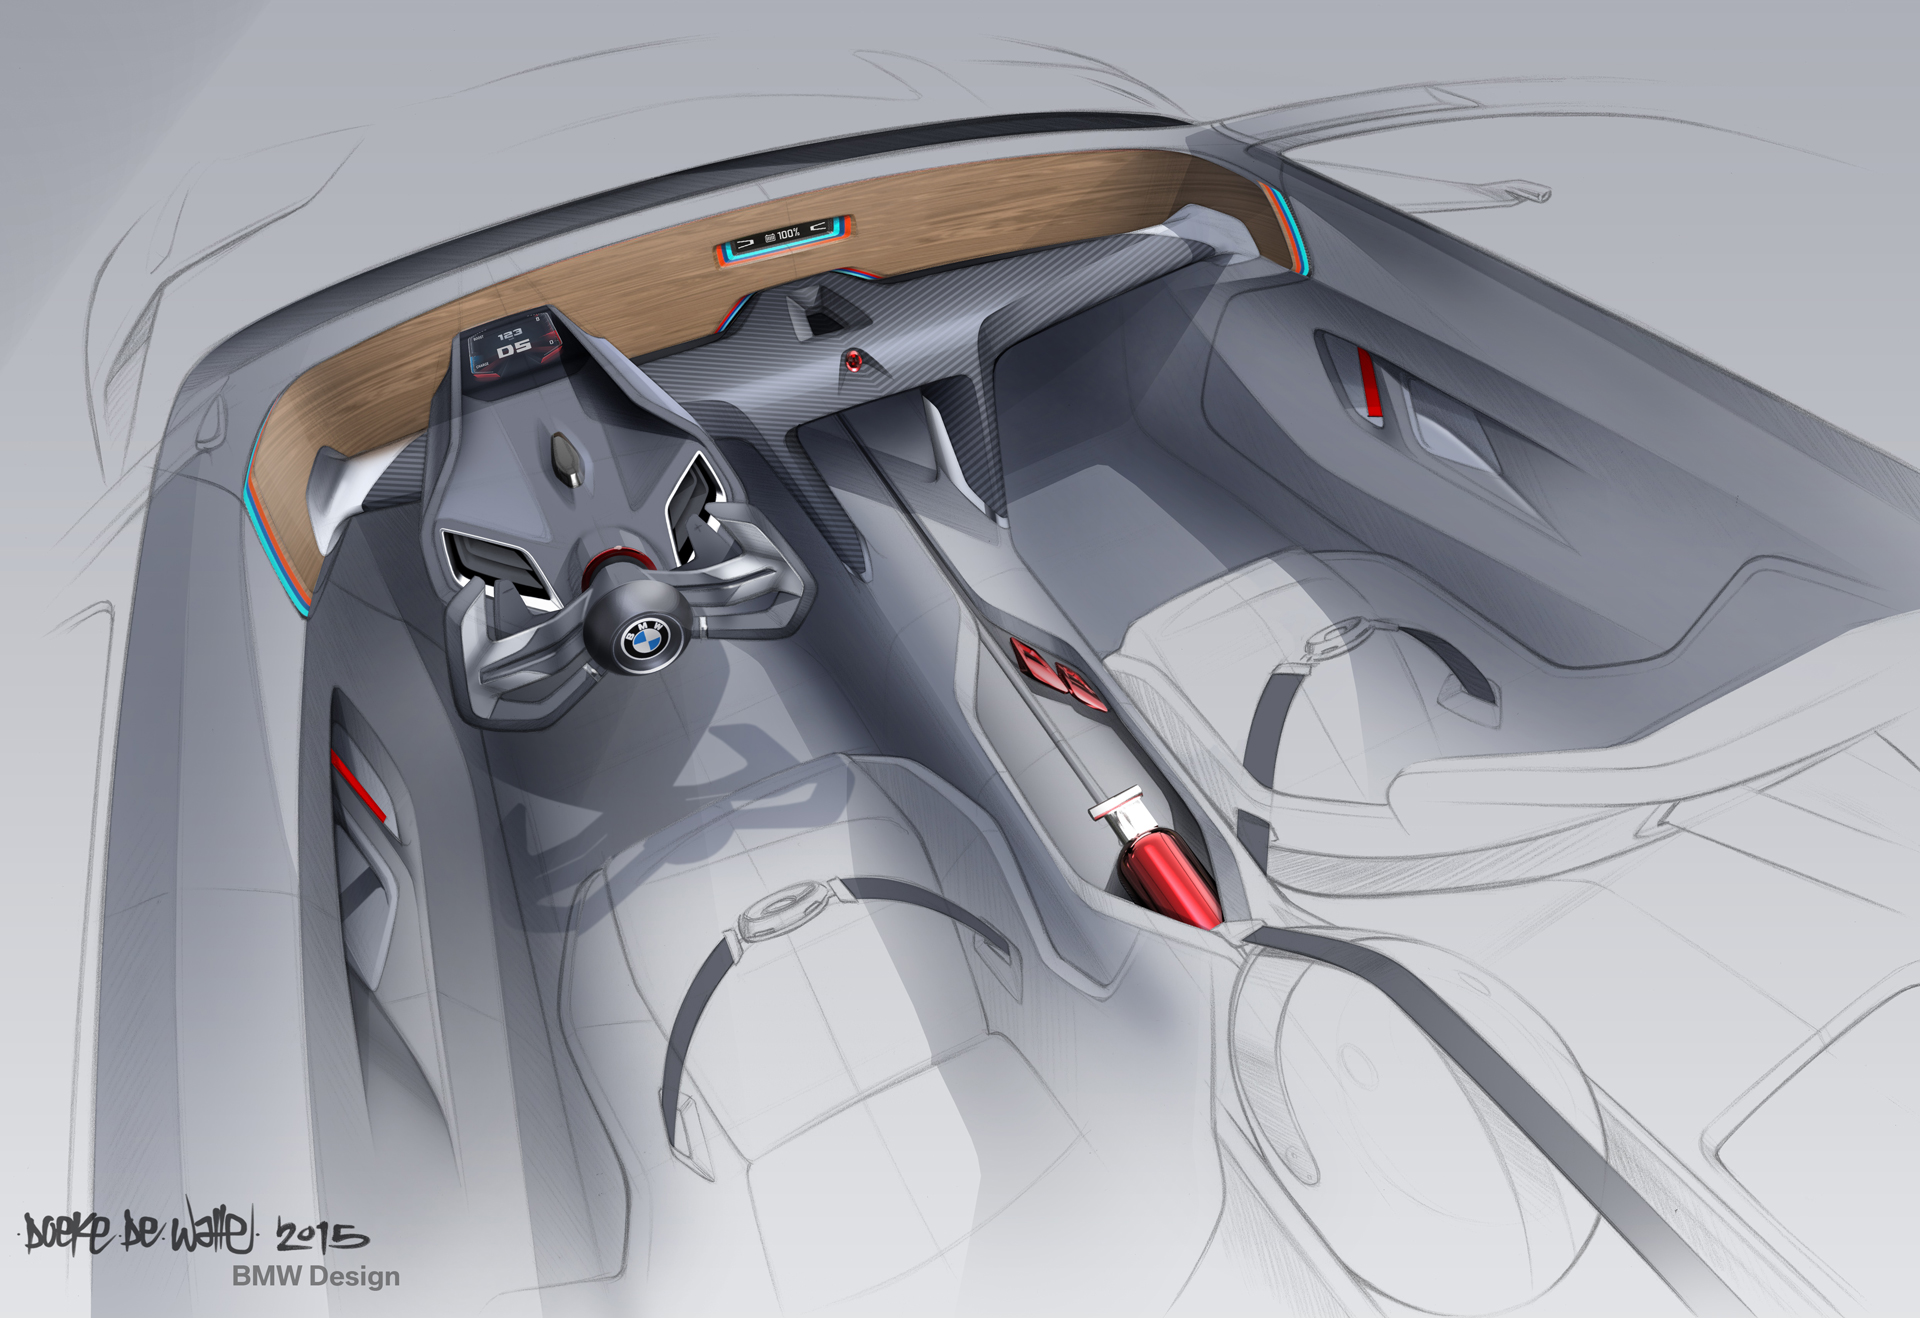 BMW 3.0 CSL Hommage - sketch inside